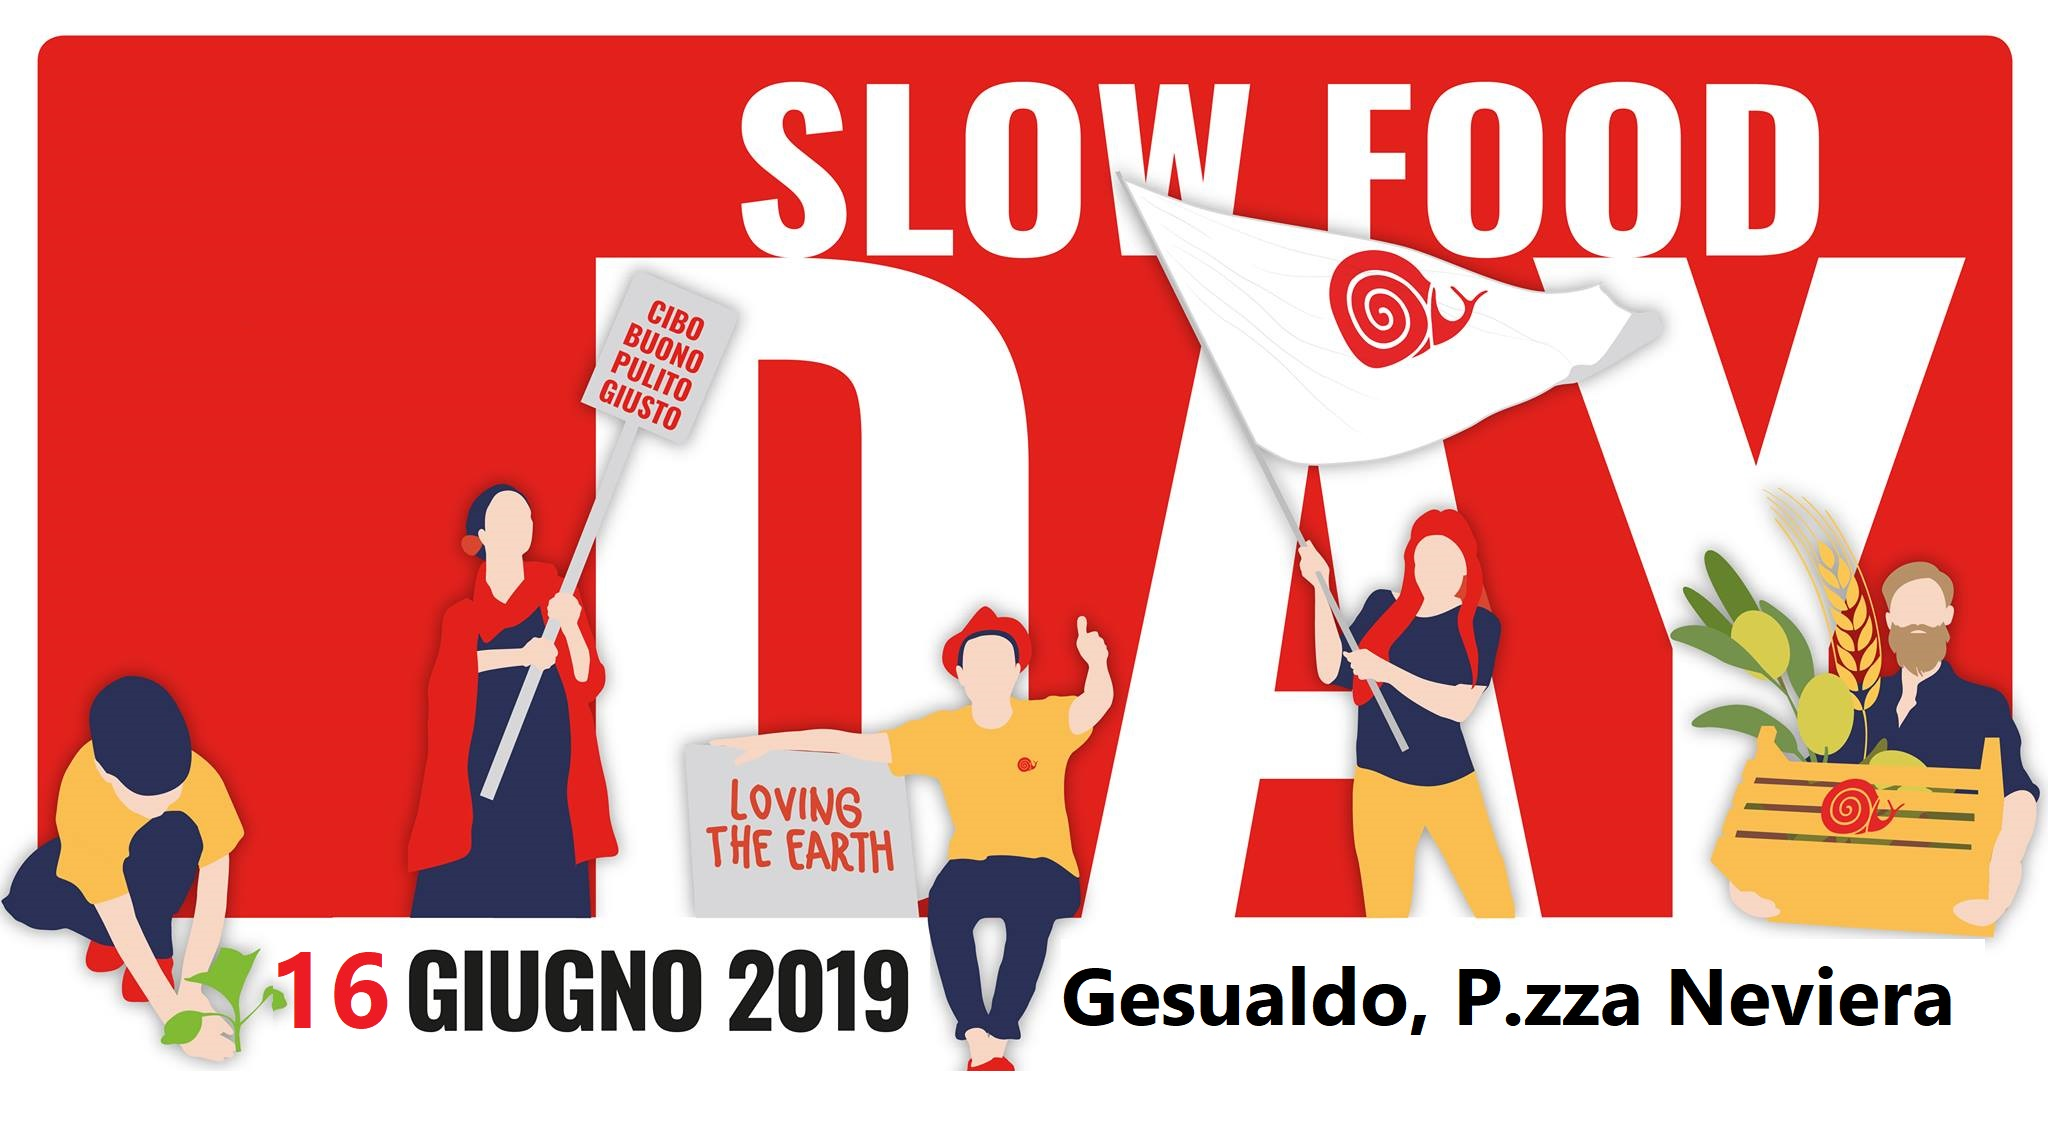 Slow-Food-Day-2019-a-Roseto-degli-Abruzzi